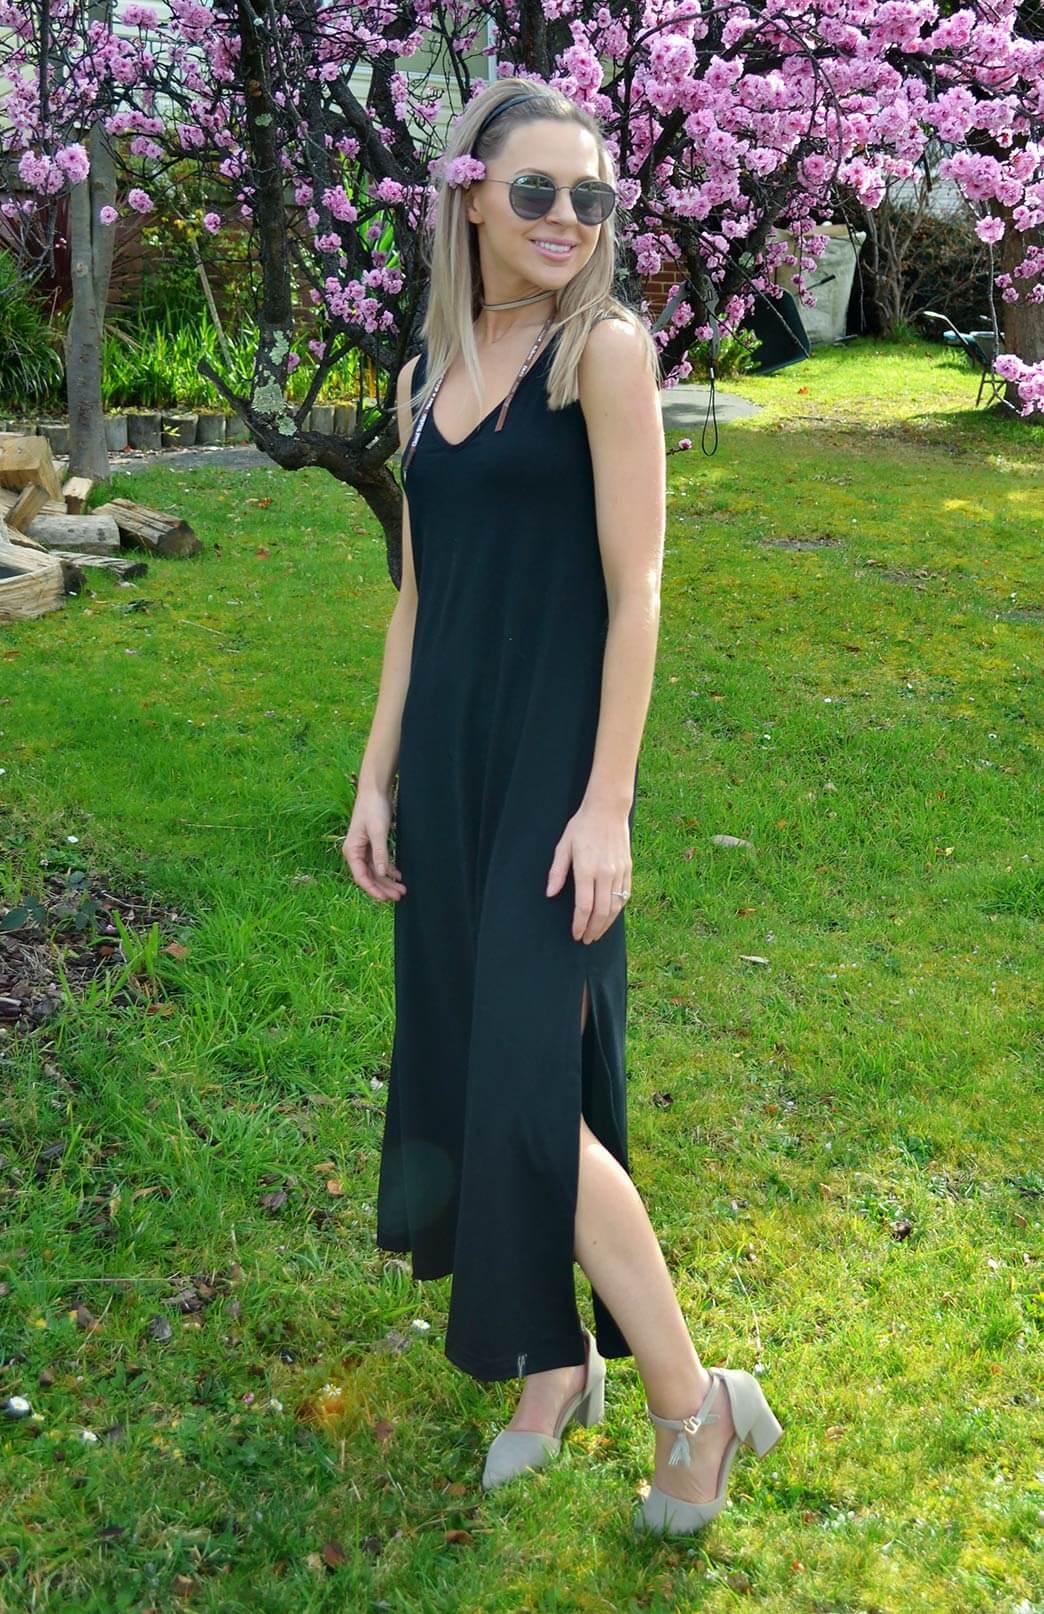 V-Neck Maxi Dress - Women's Black Merino Wool V-Neck Sleeveless Maxi Dress - Smitten Merino Tasmania Australia